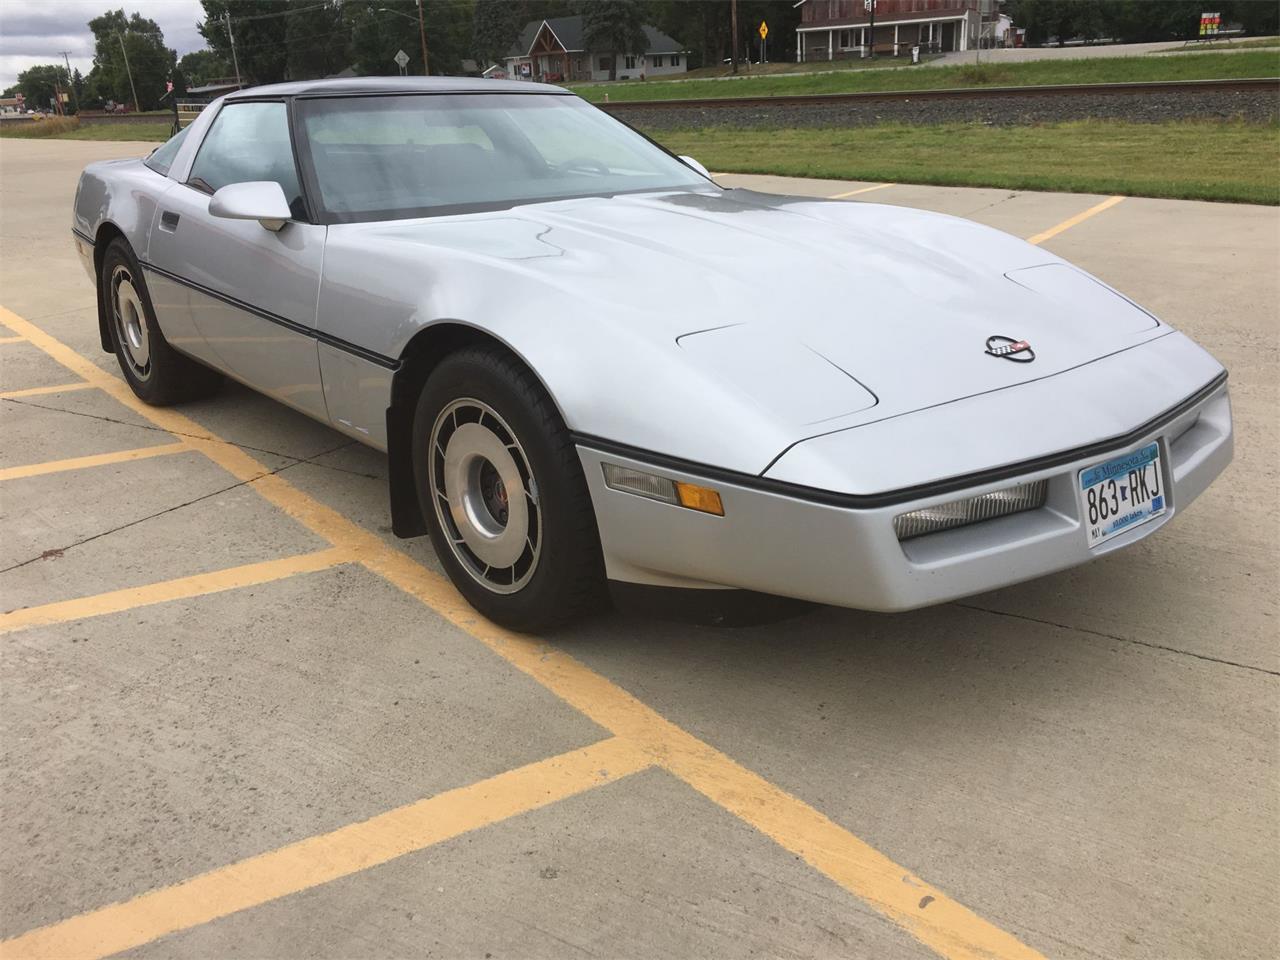 Large Picture of 1984 Corvette located in Minnesota - $11,500.00 - LME4